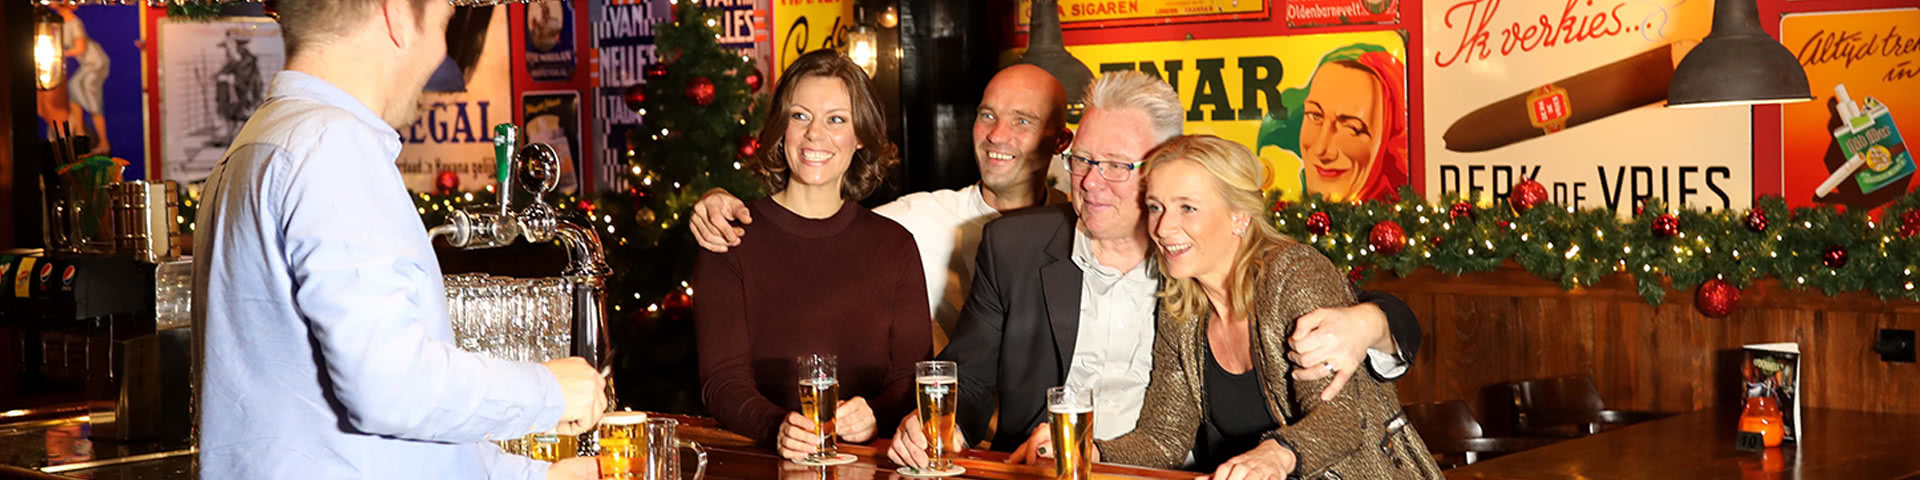 Gruppe an der Bar im weihnachtlich geschmückten Pub in Egmond aan Zee